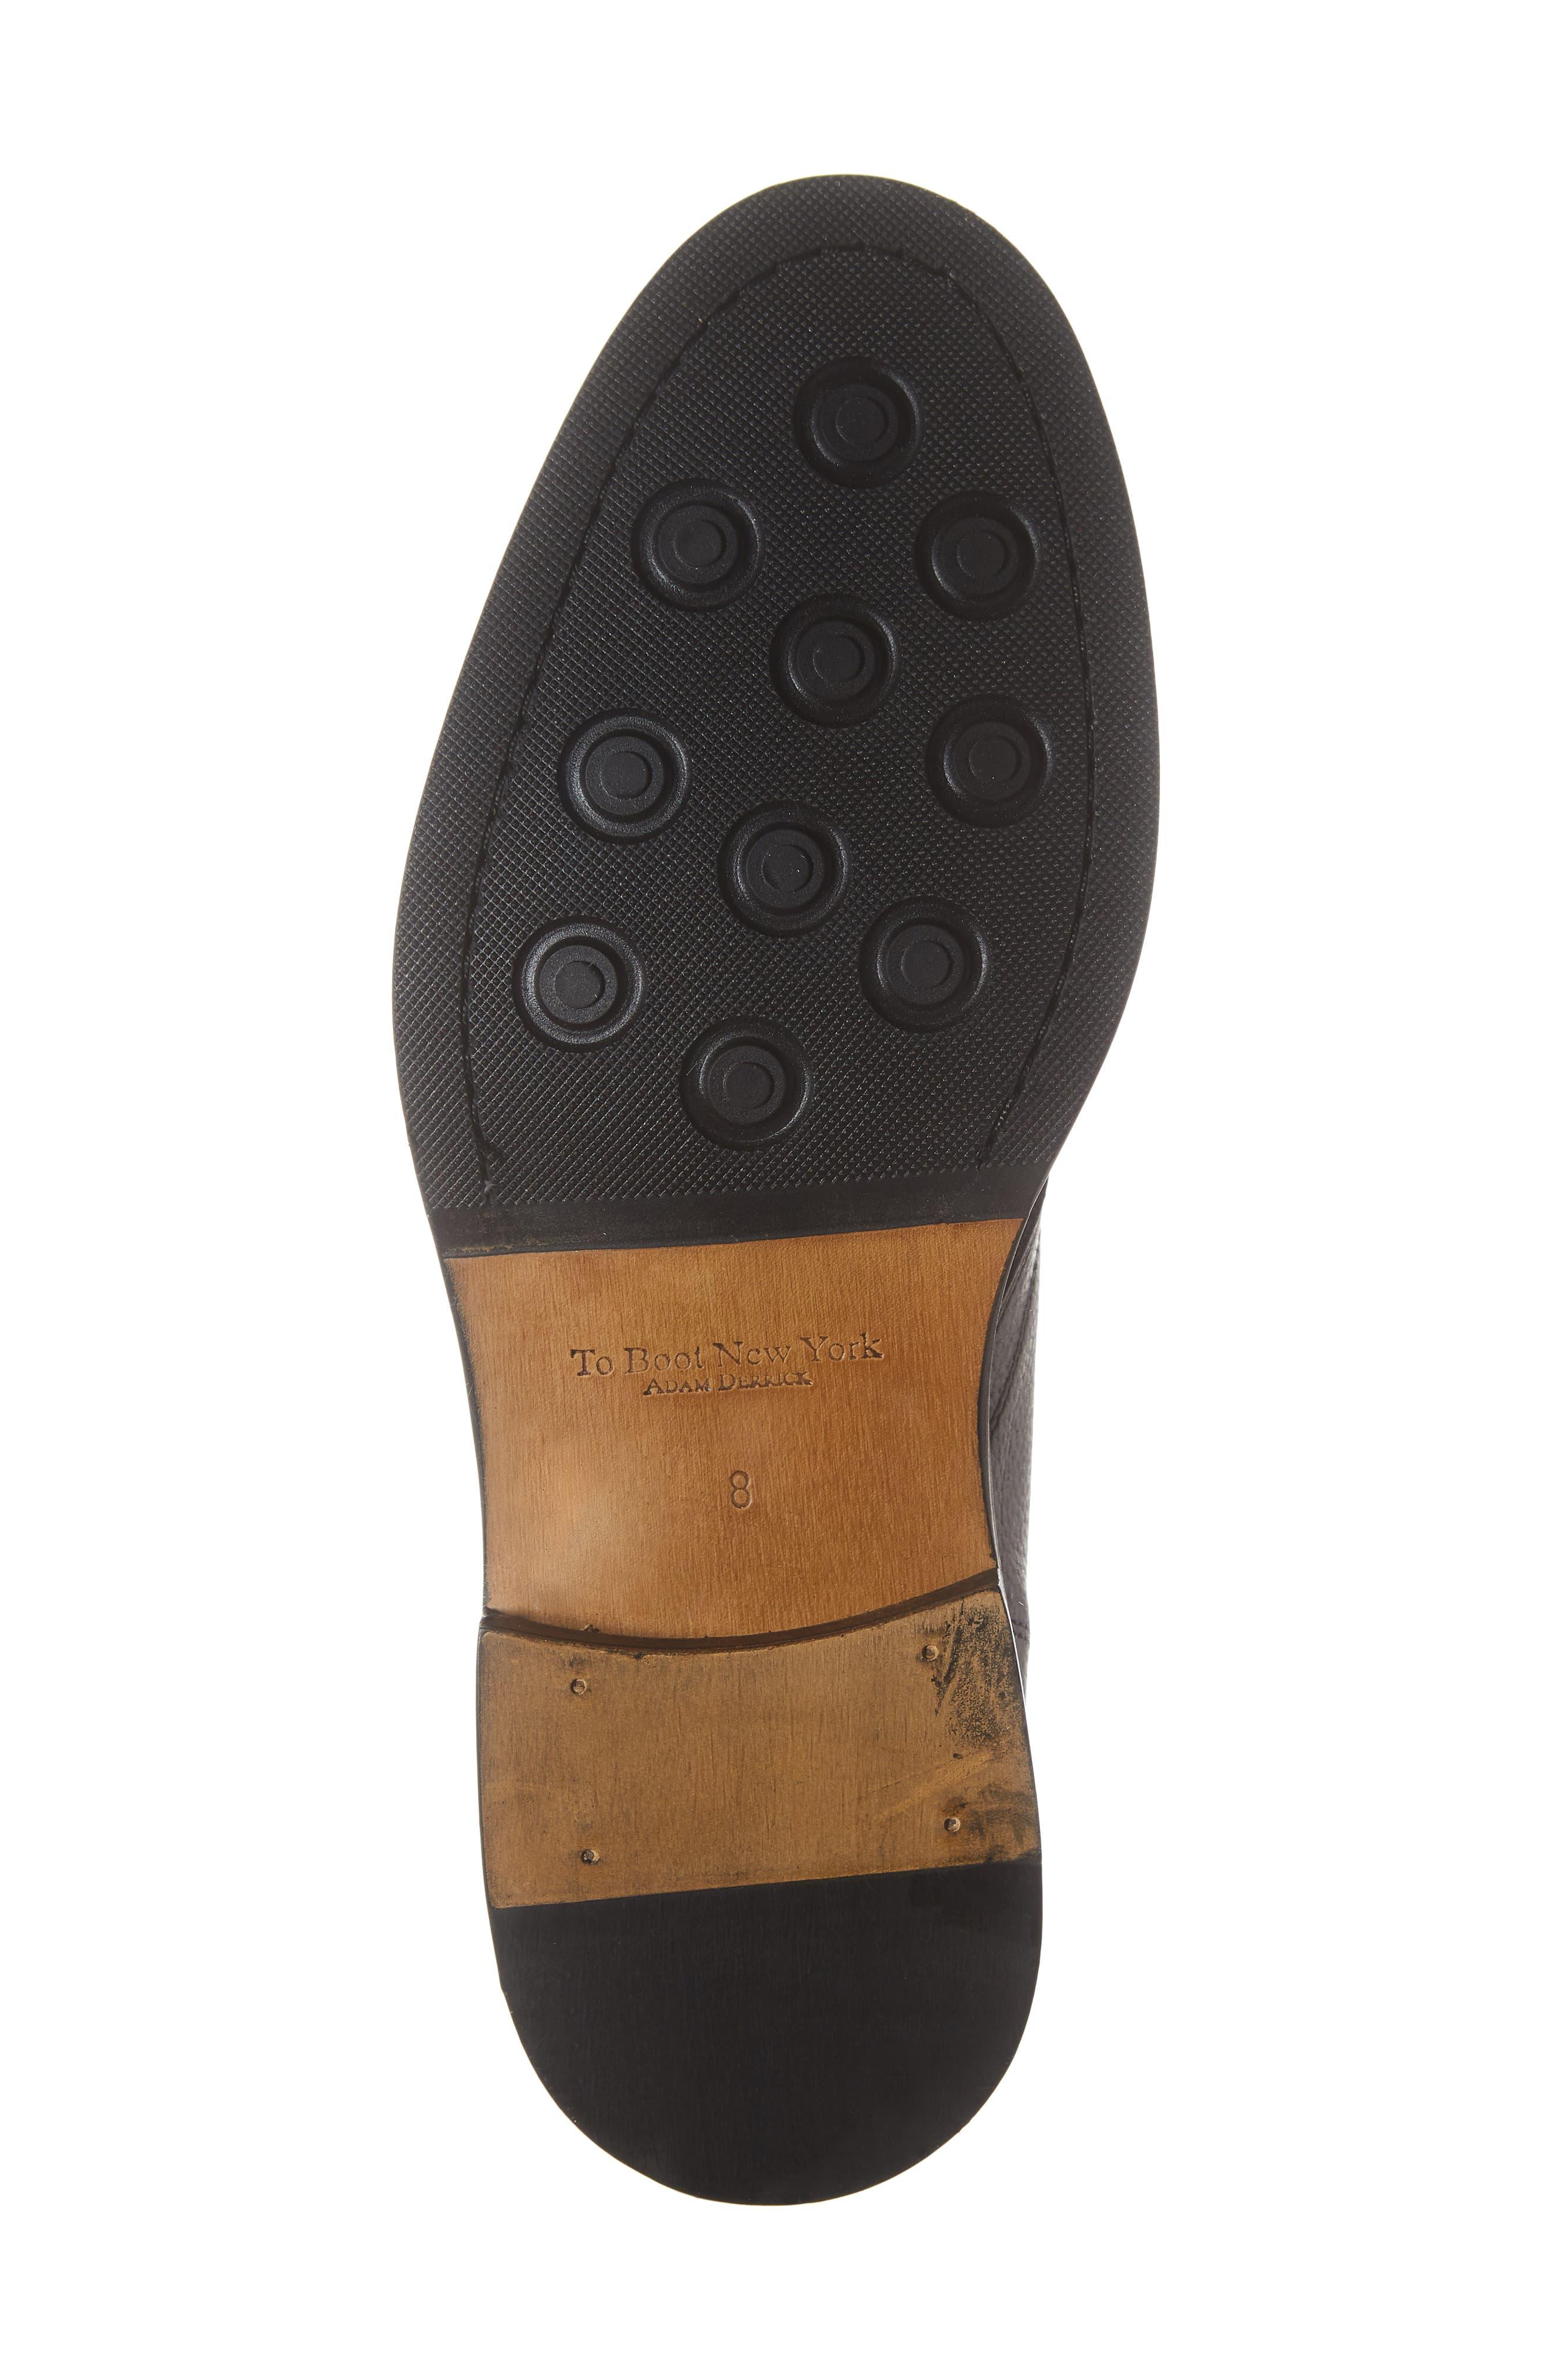 Bruin Plain Toe Chukka Boot,                             Alternate thumbnail 6, color,                             VITELLO STOMPA NERO LEATHER